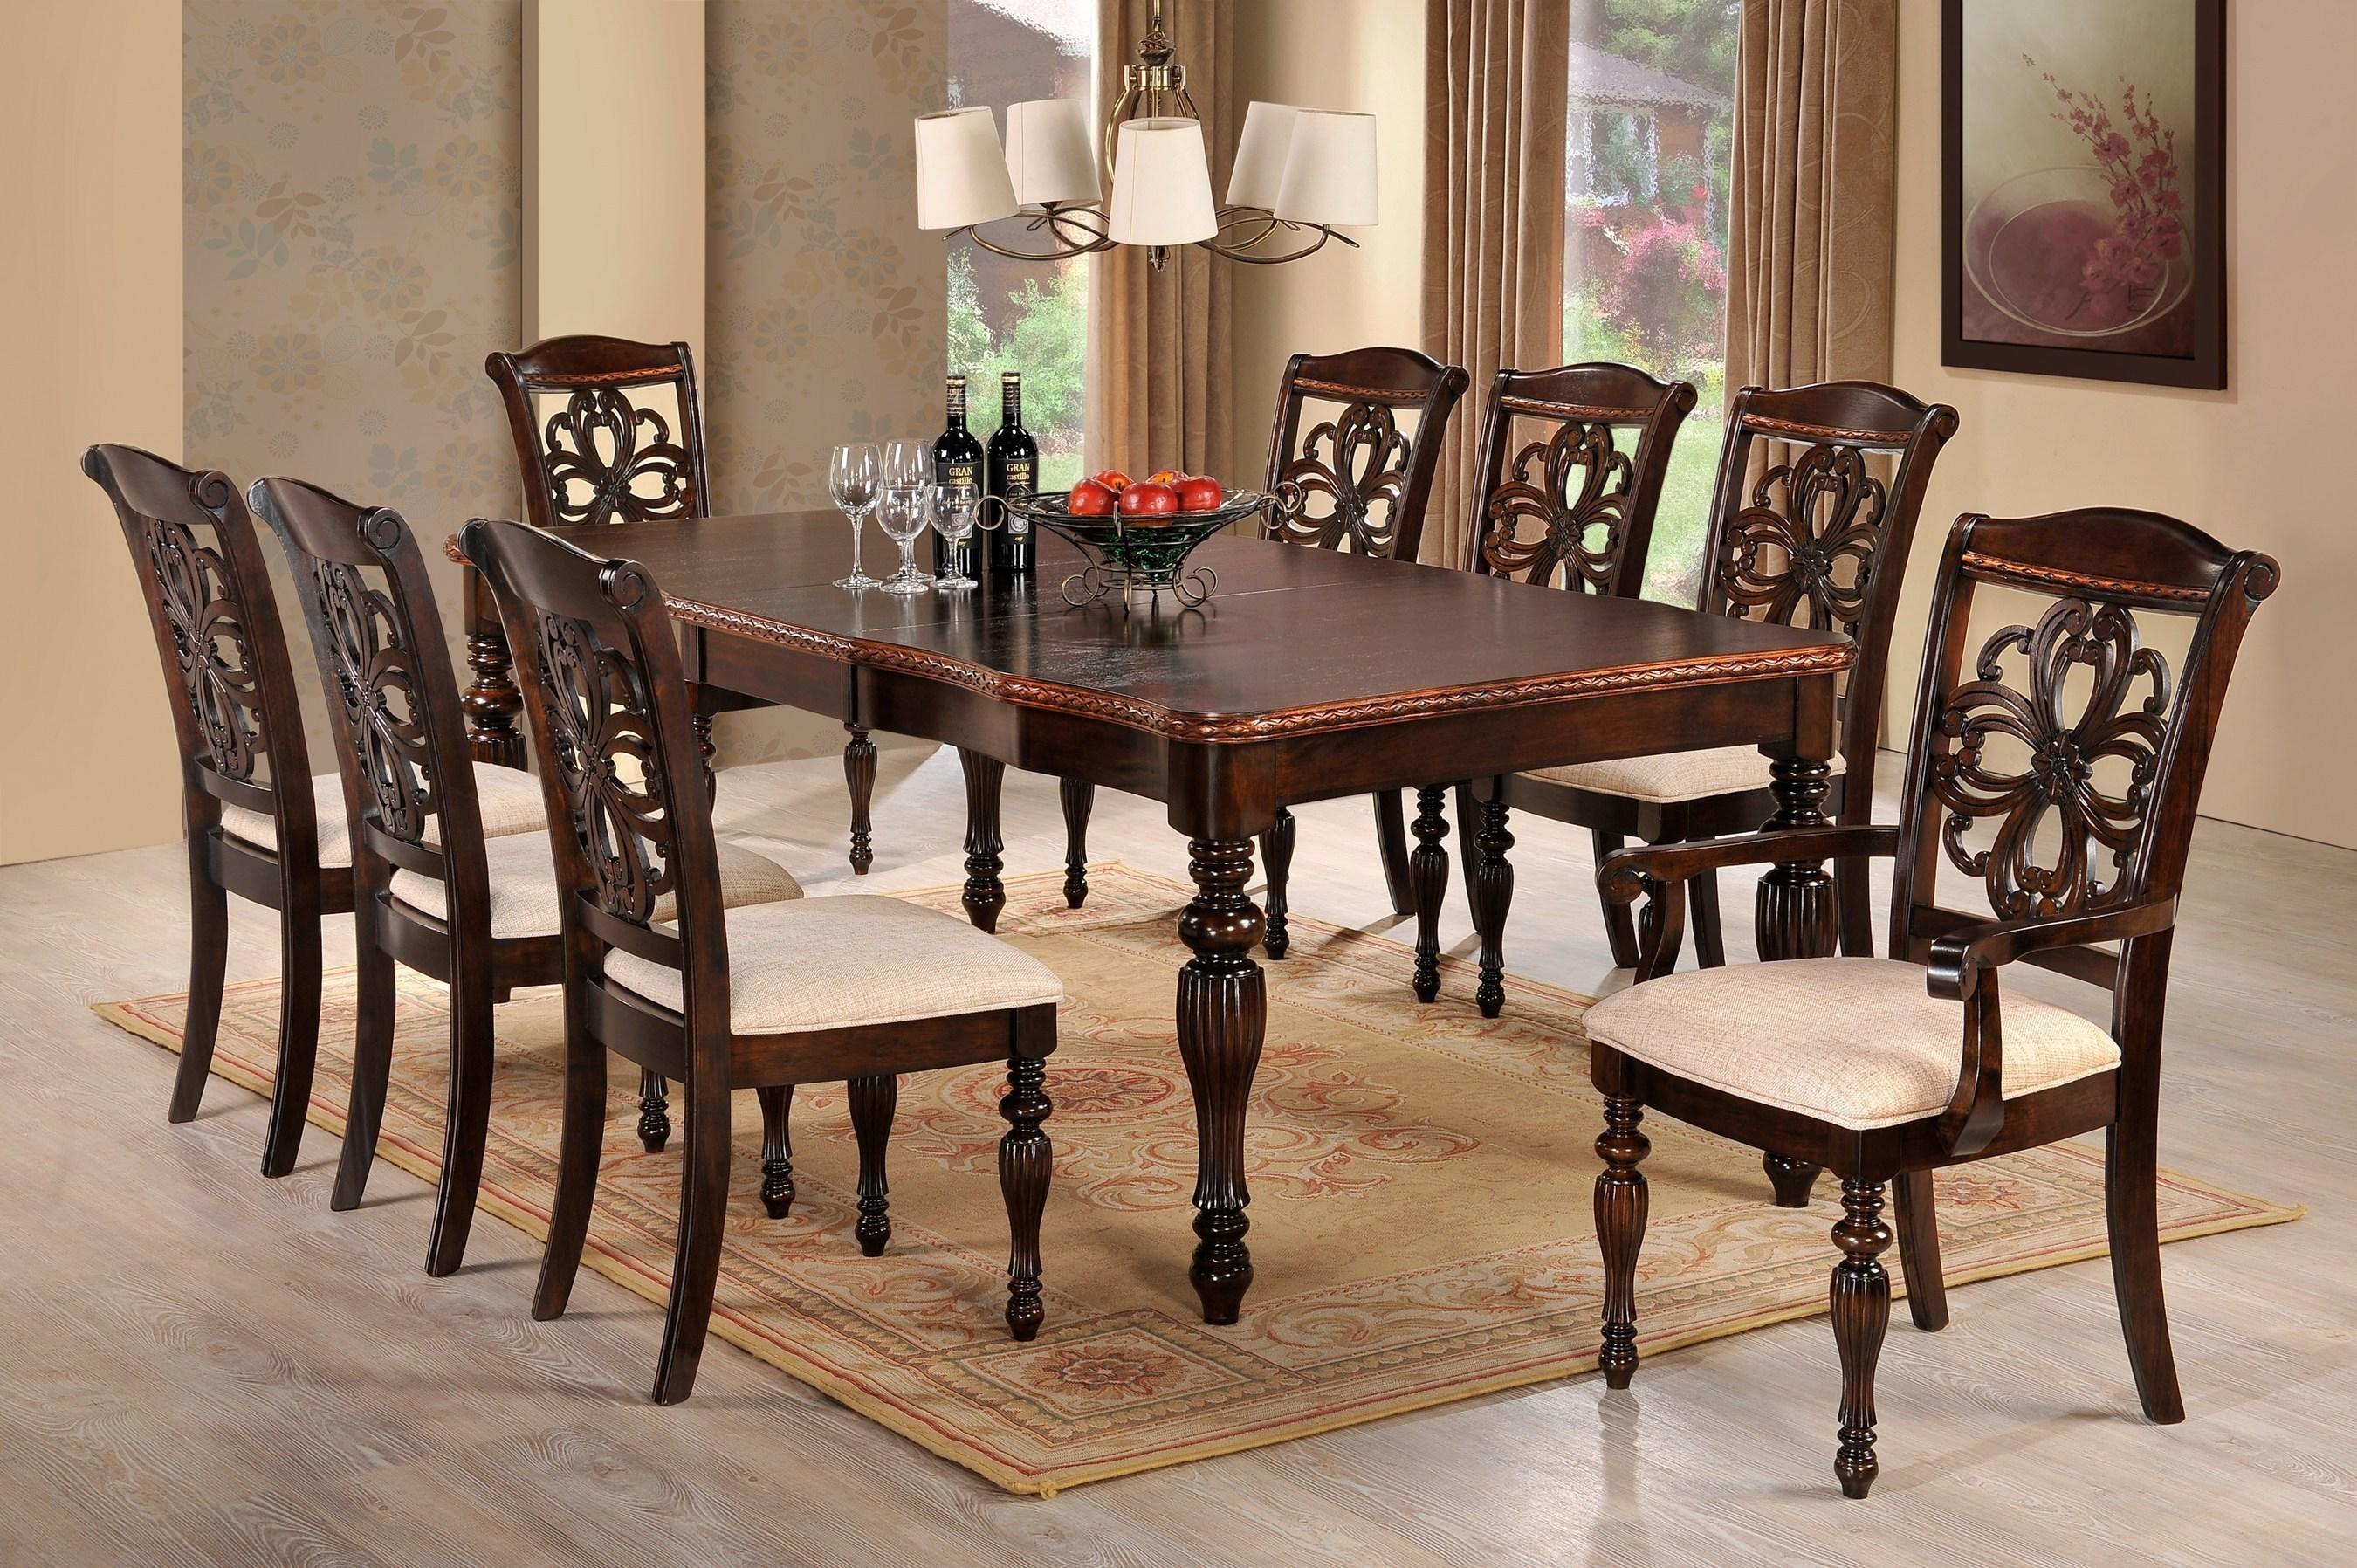 Malaysian International Furniture Fair 2015 Sets Trade